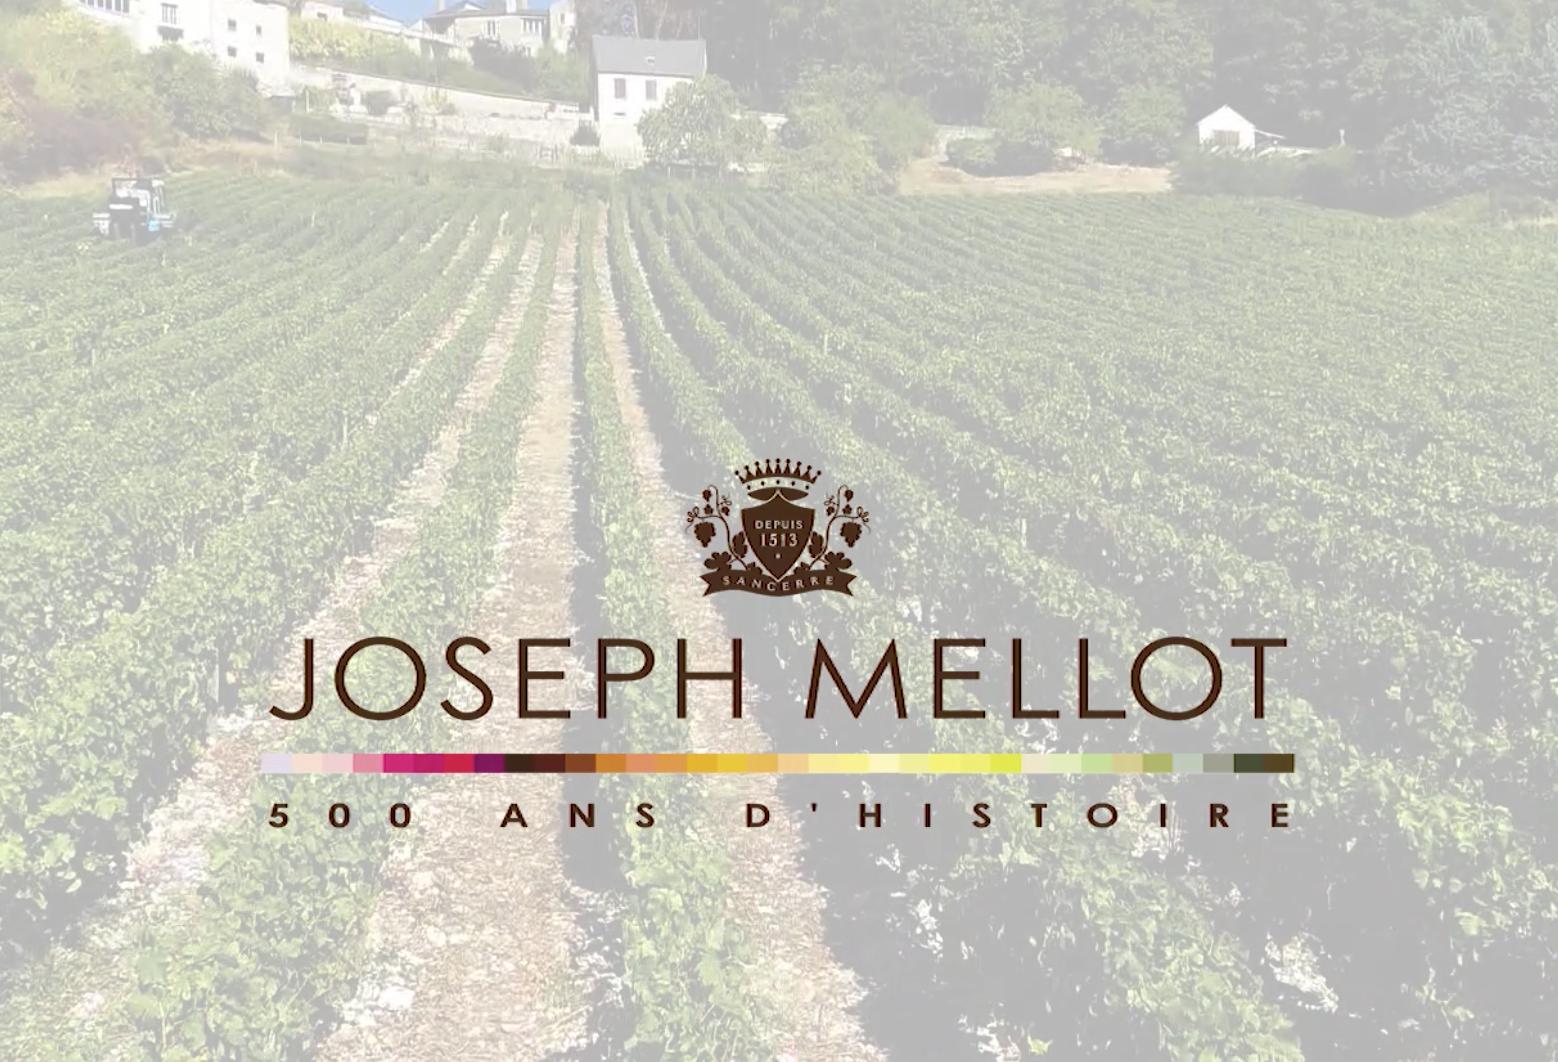 Joseph Mellot - Vidéo Présentation